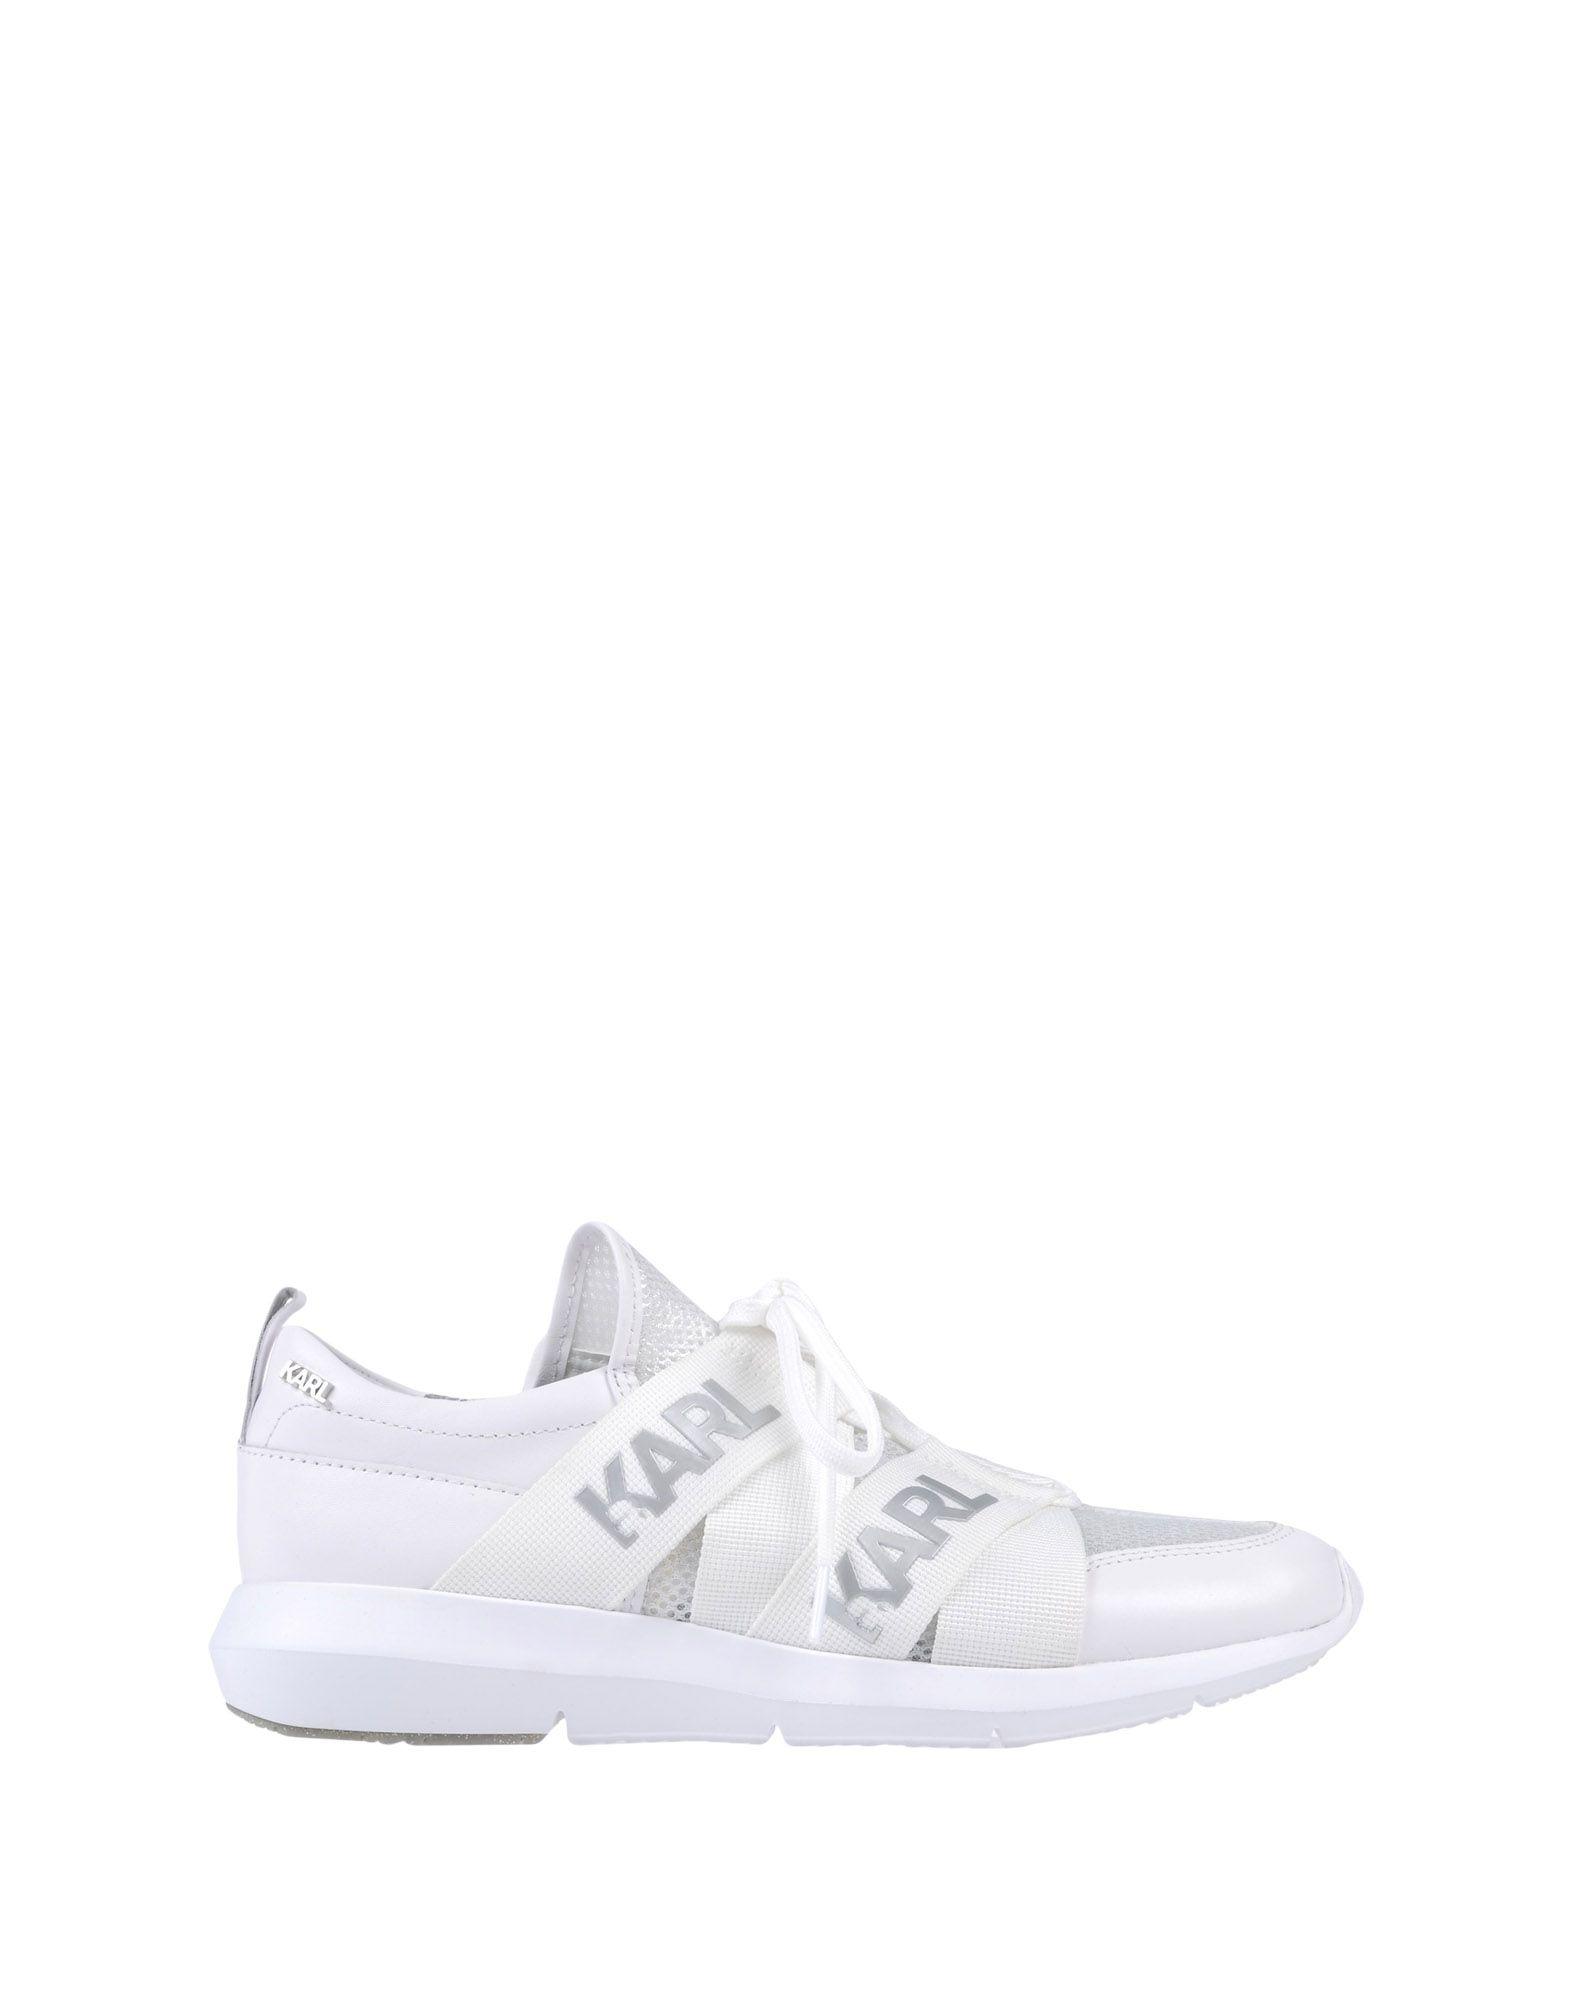 ... Sneakers Karl Lagerfeld Vitesse Legere Strap Mesh - Femme - Sneakers  Karl Lagerfeld sur ...